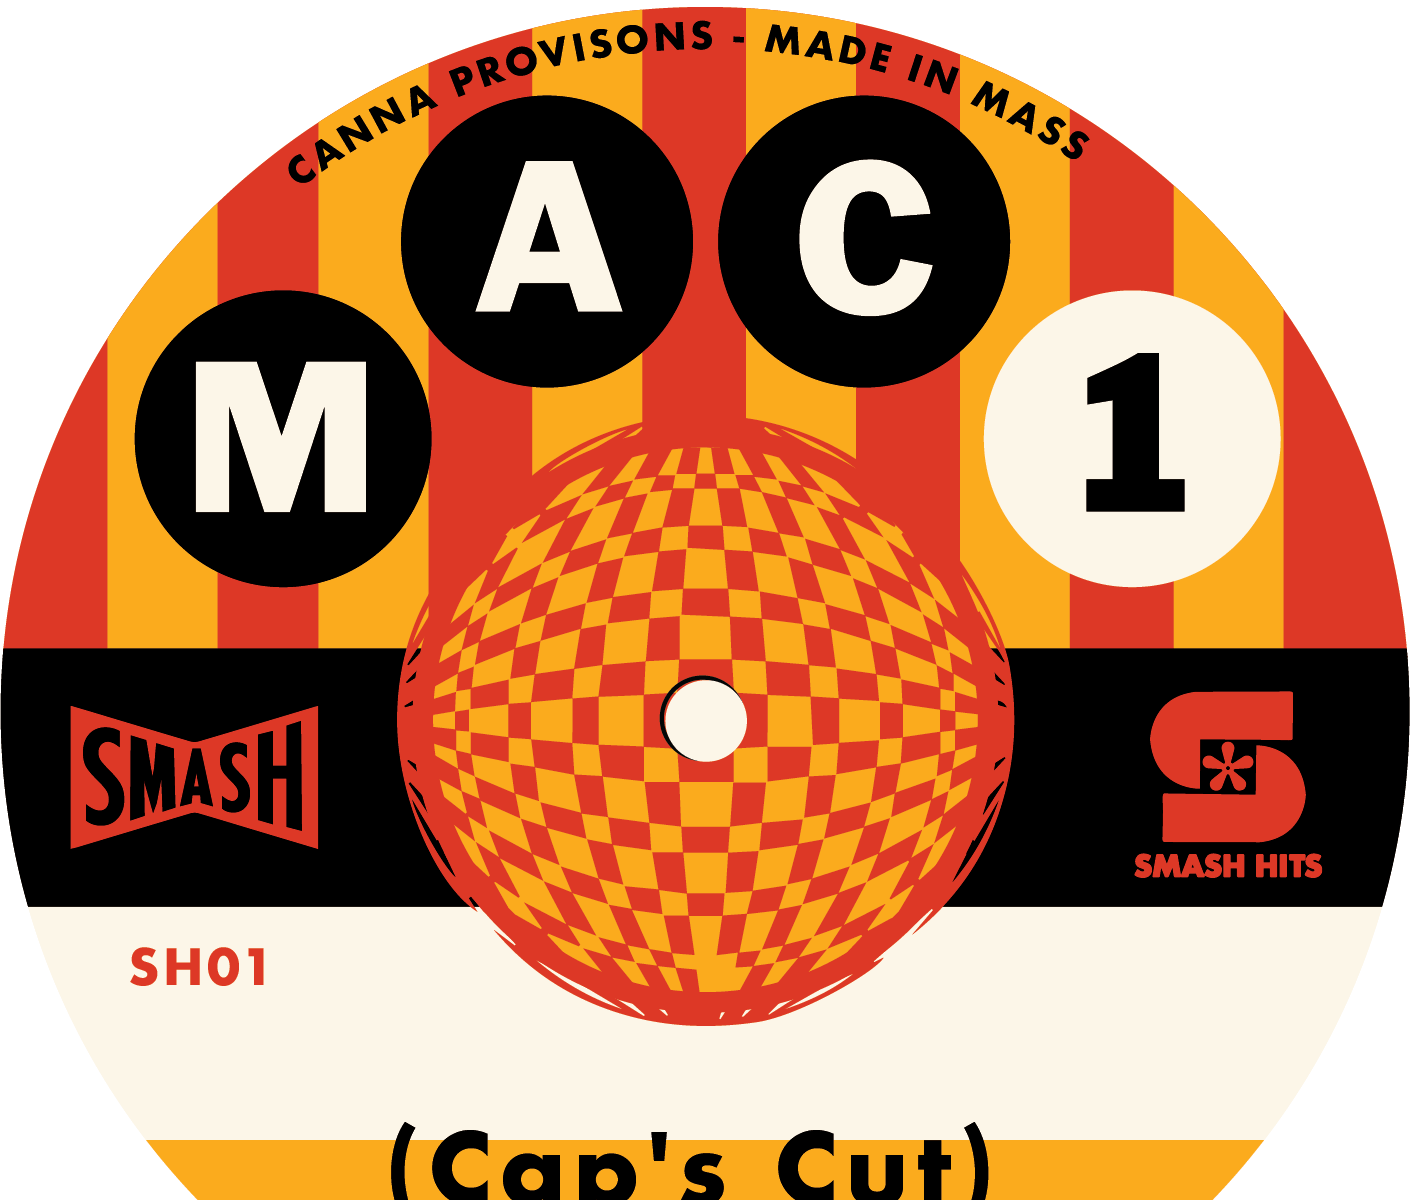 MAC 1 CAP's smash hits chemdog canna provisions